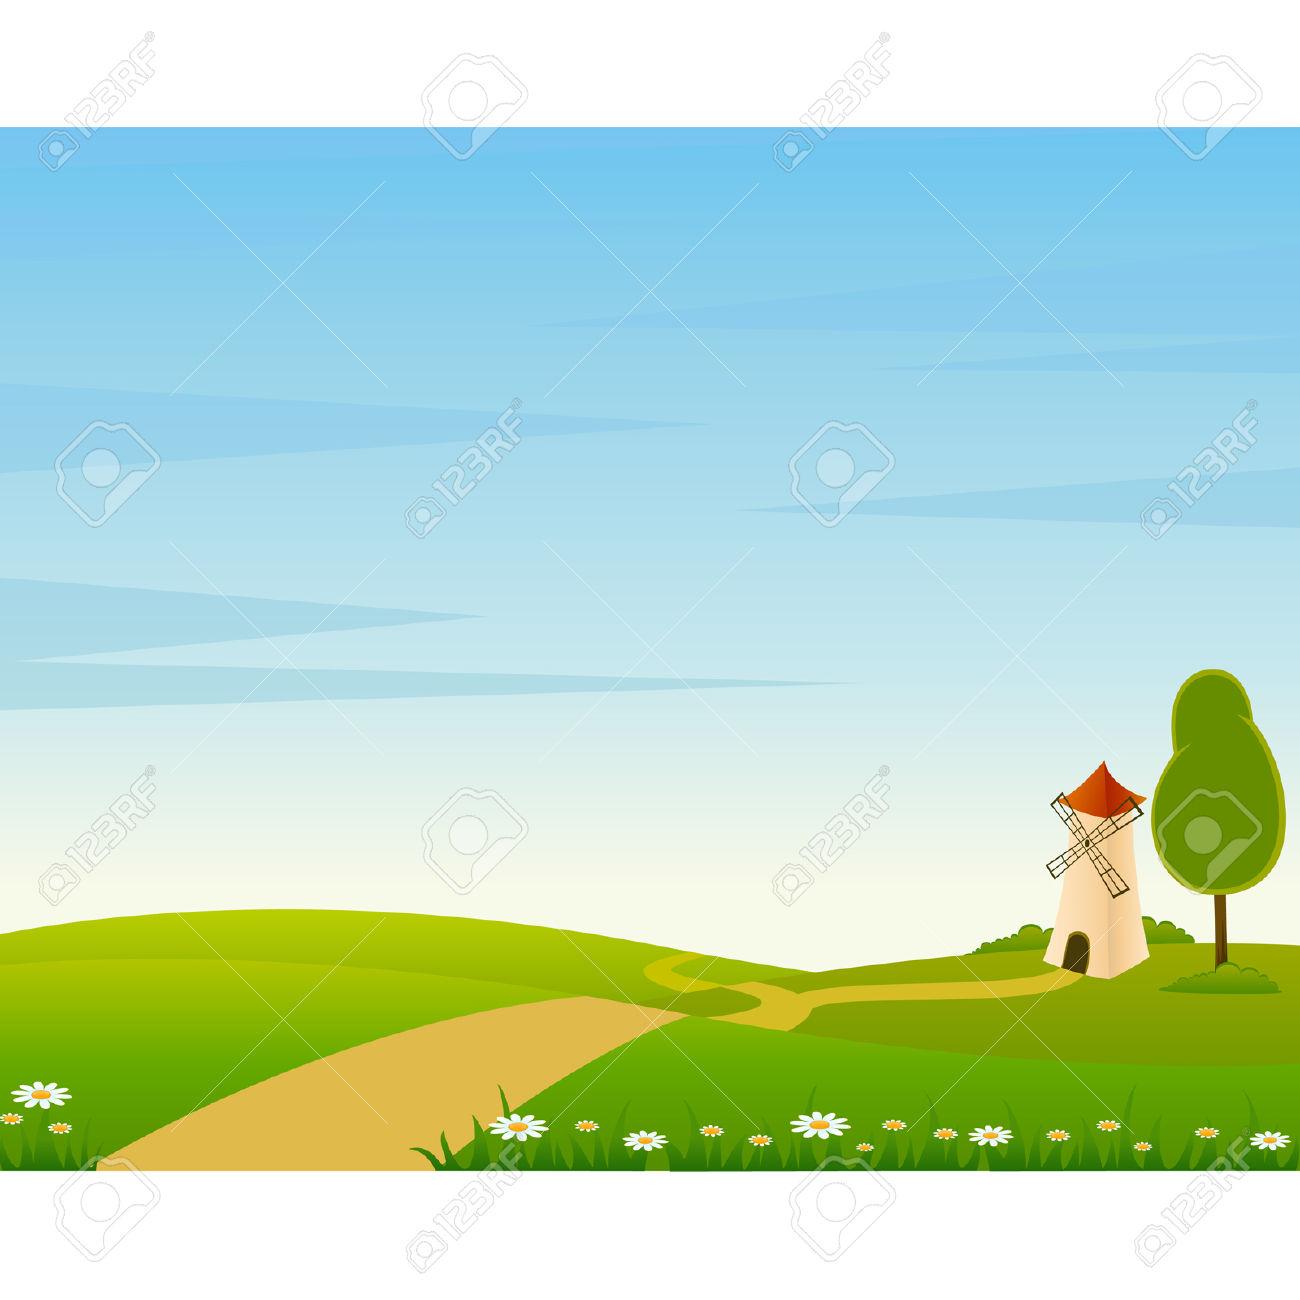 Cartoon Farm Landscape Clipart | Clipart Panda - Free Clipart Images for Farm Landscape Clip Art  110yll